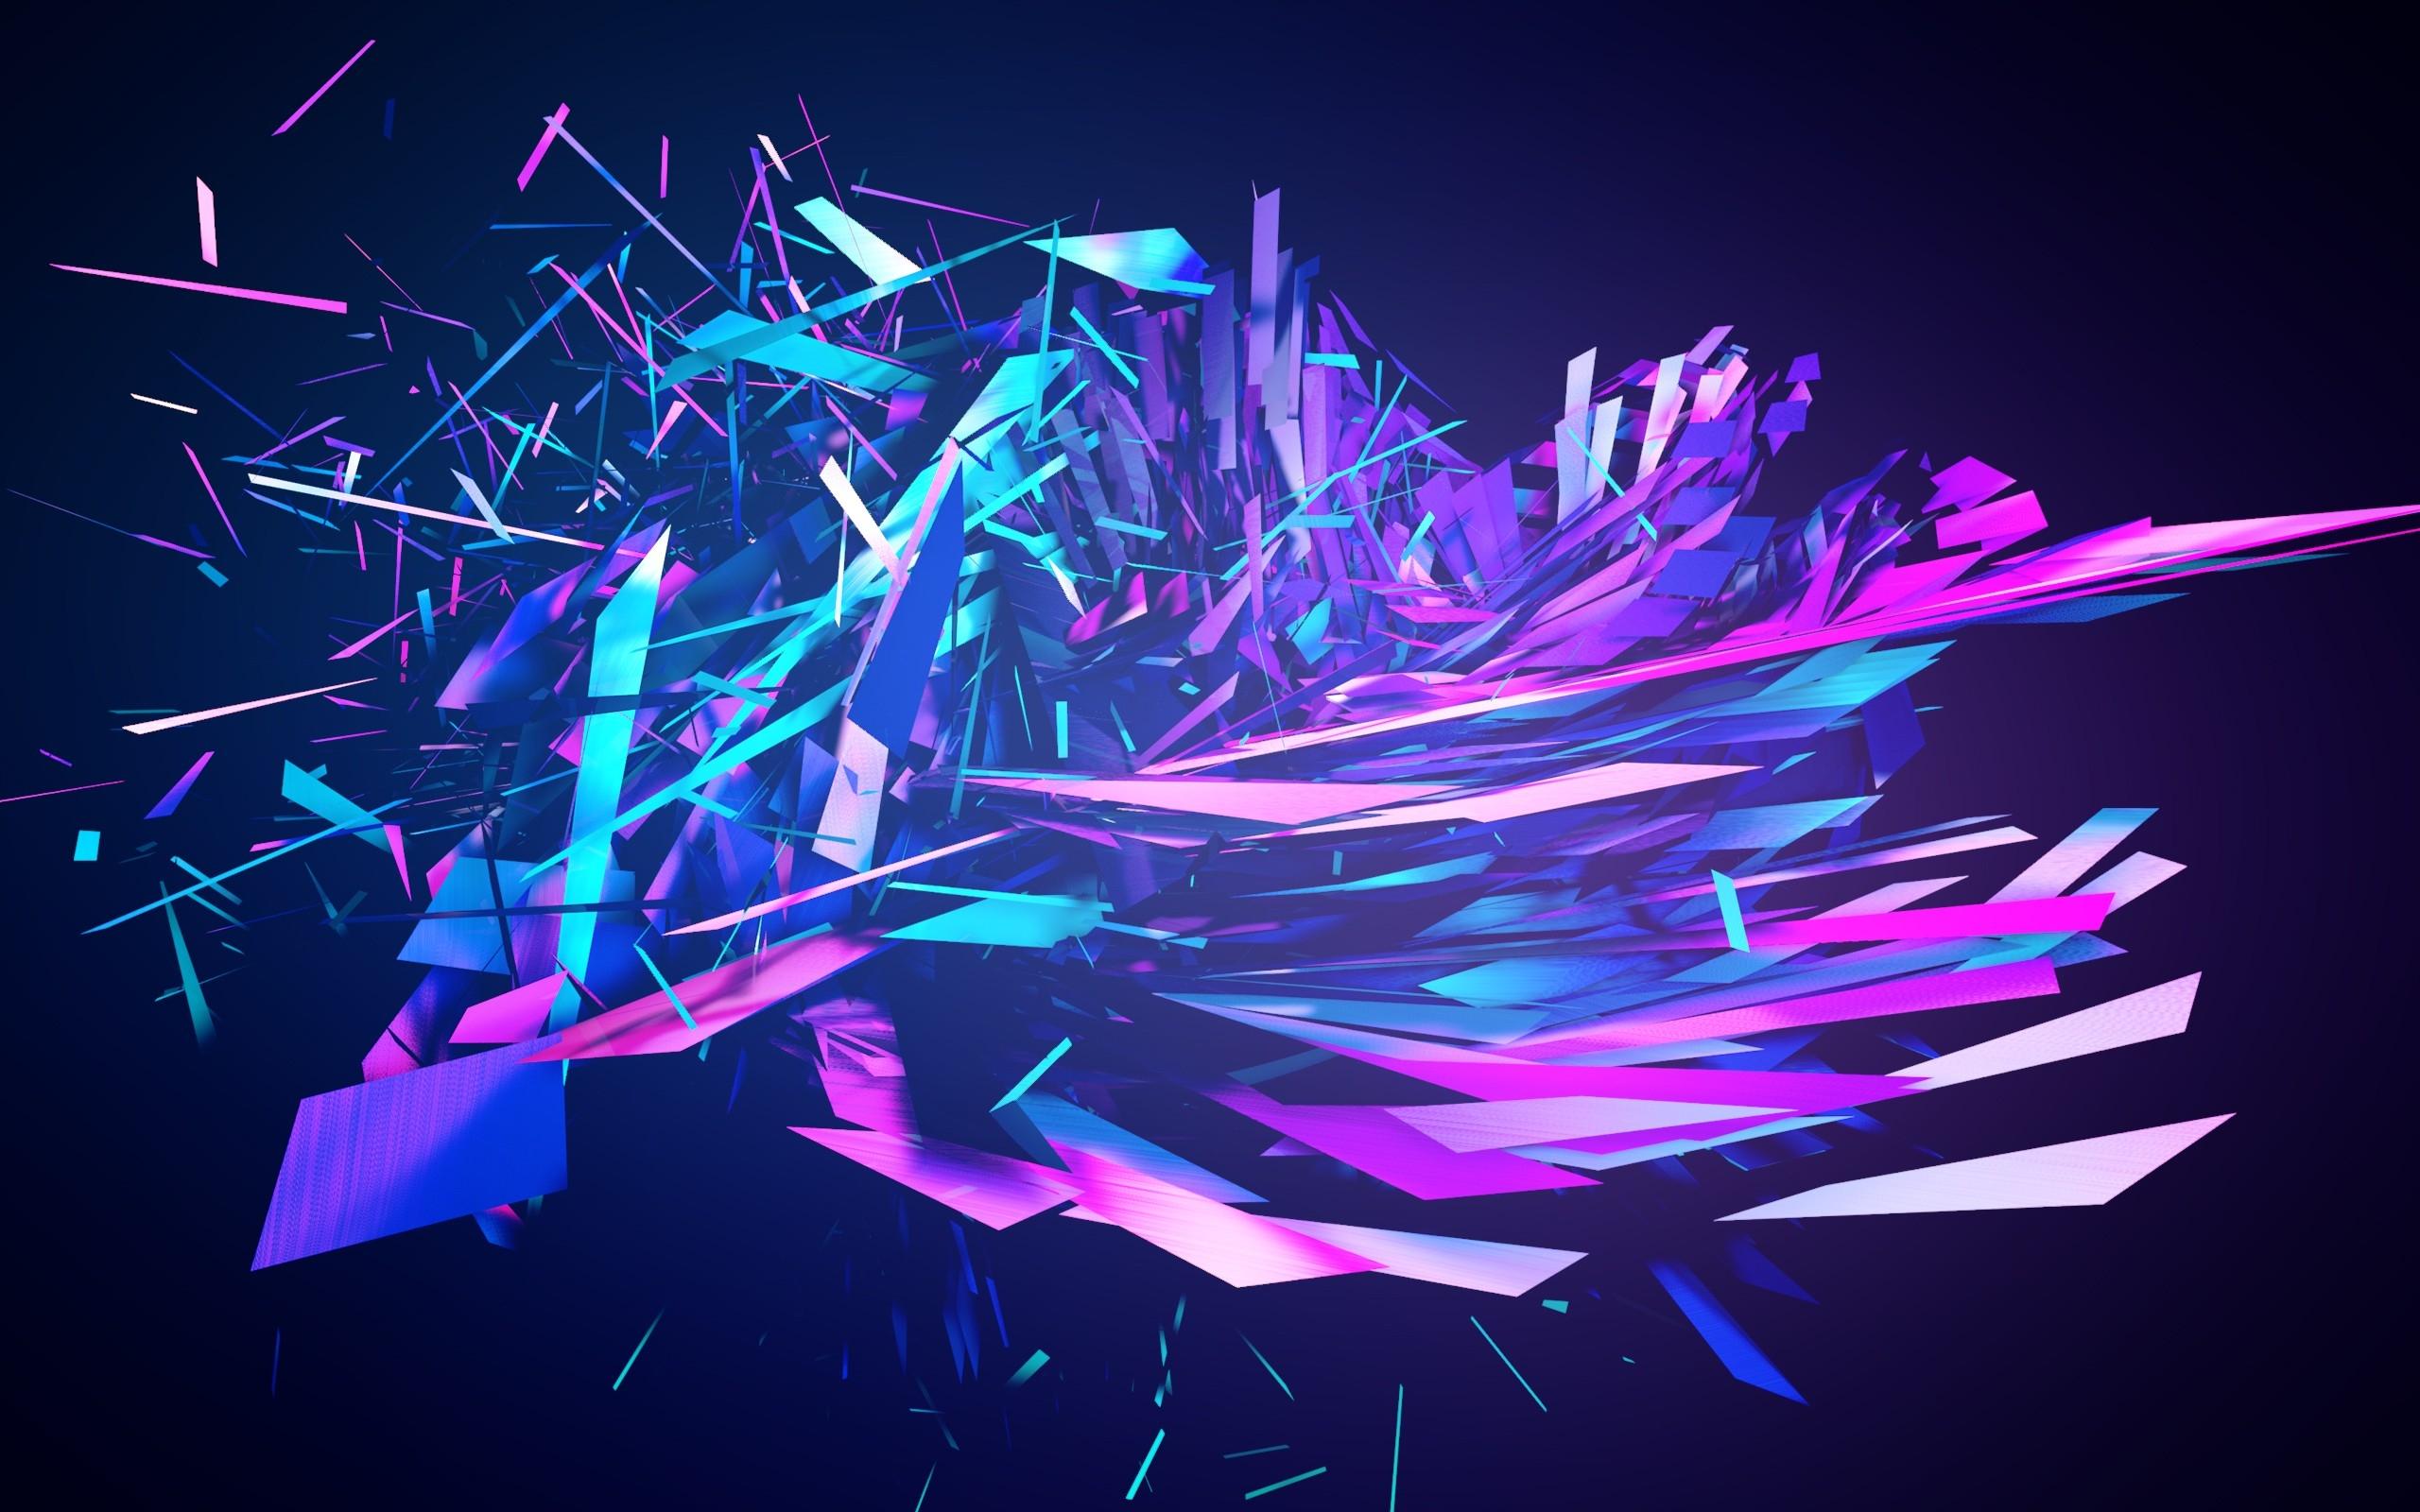 Xiaomi Wallpaper Blue Black: Broken Into Pieces Abstract, HD Abstract, 4k Wallpapers